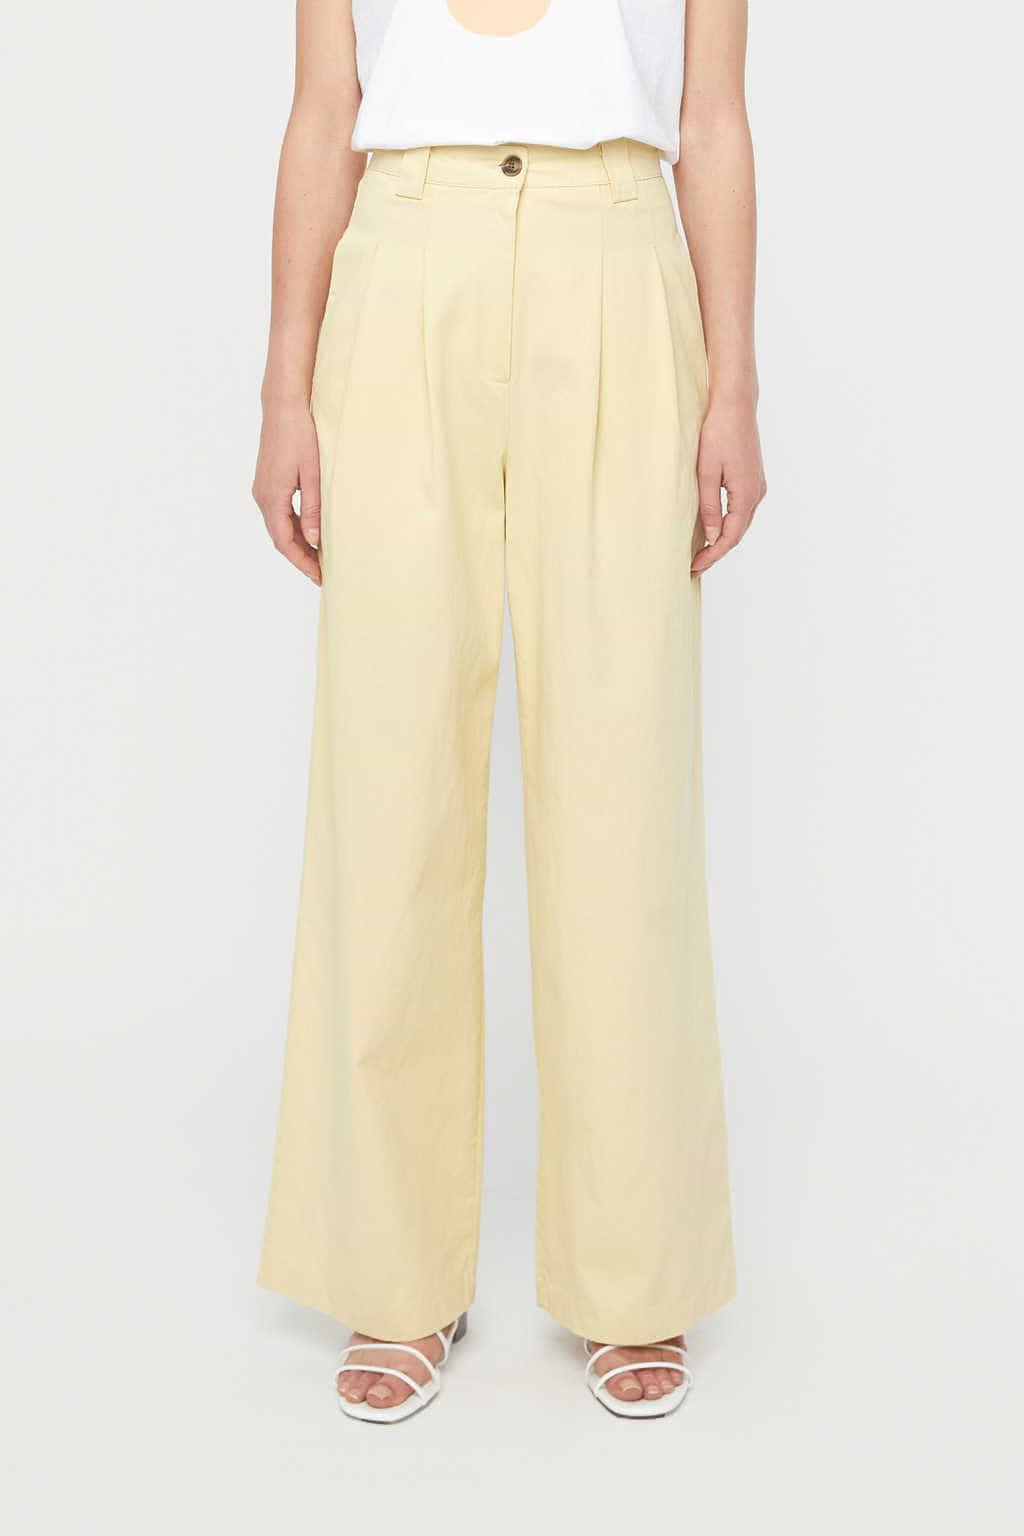 Pant K013 Yellow 3